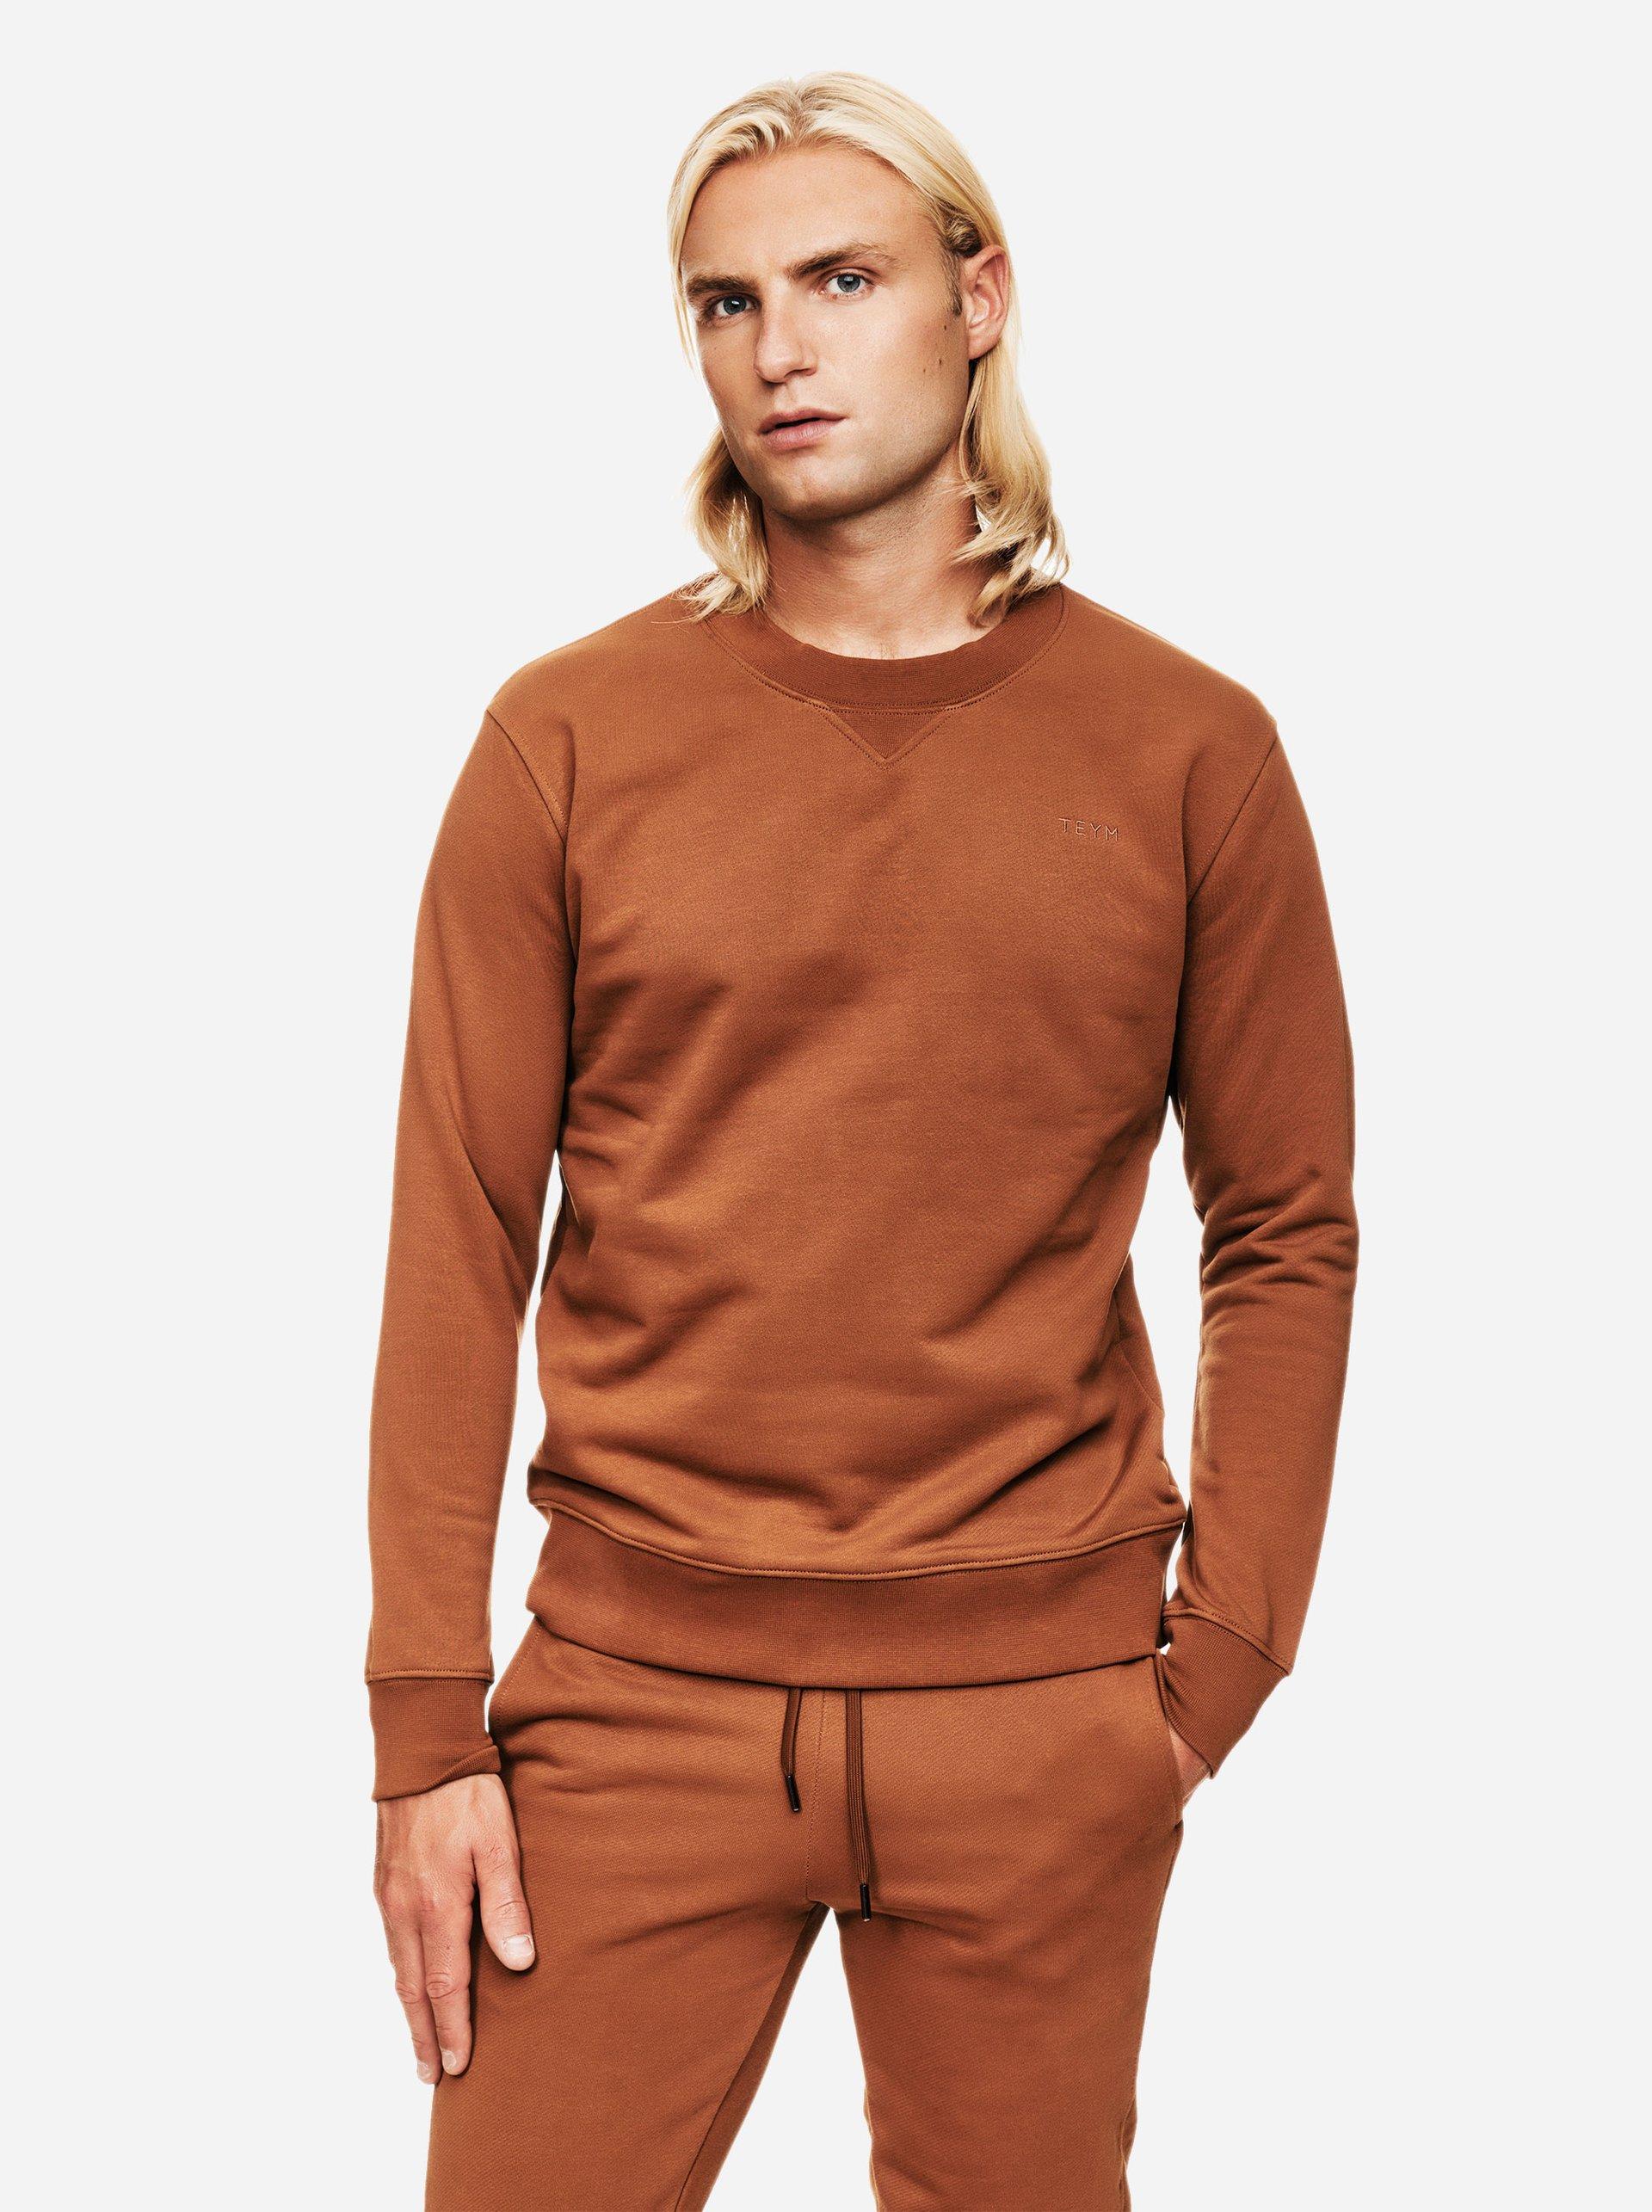 Teym-TheSweatshirt-Men-Camel01